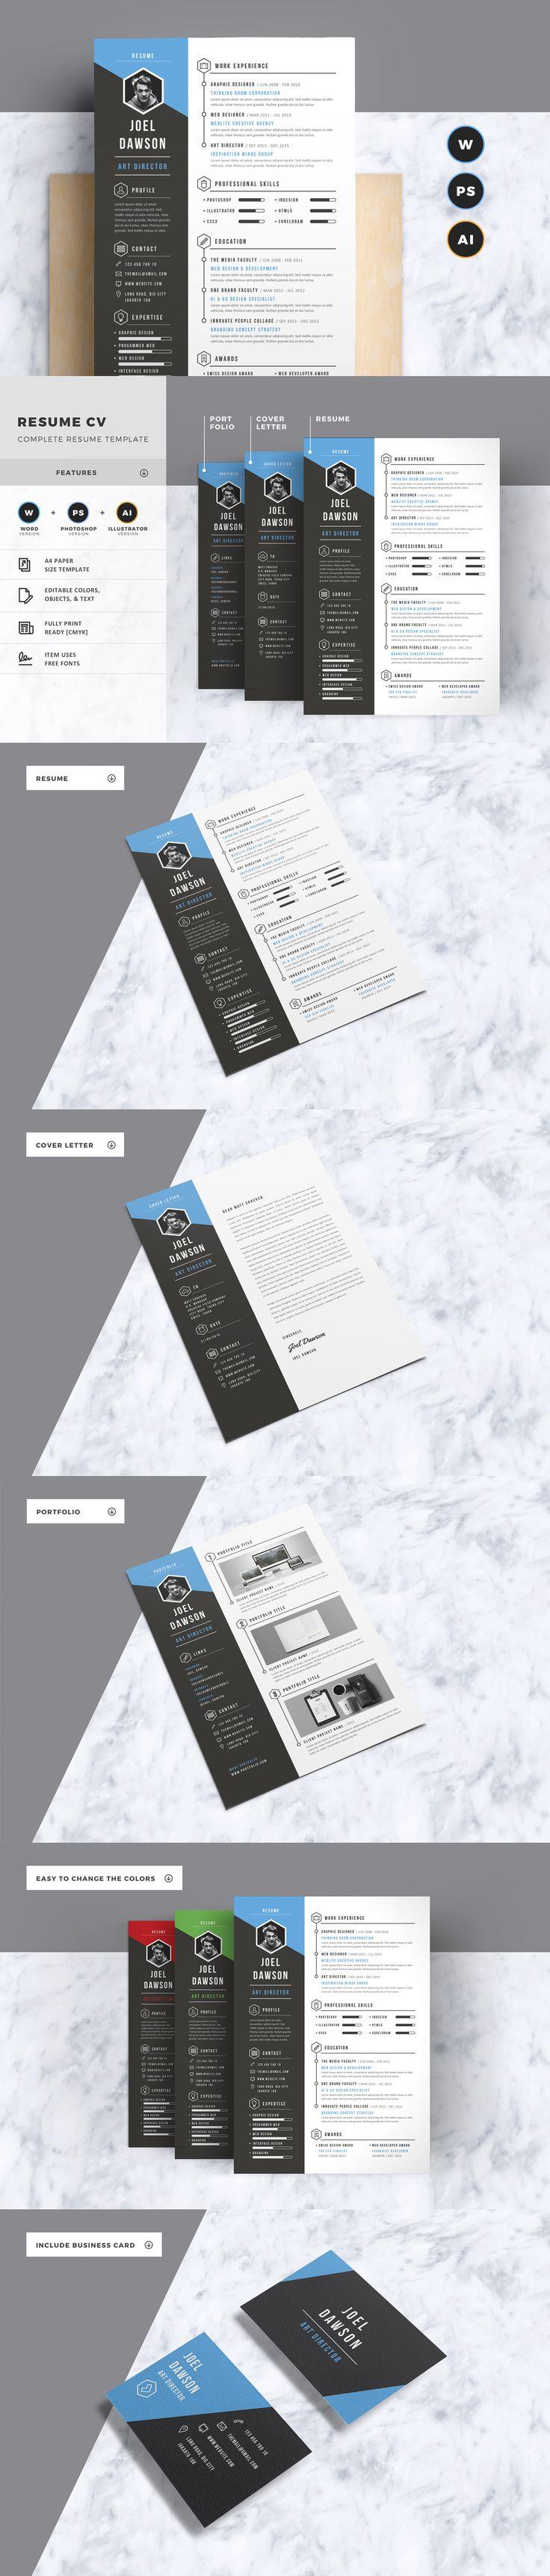 Design poster microsoft word - Resume Cv Template Ai Eps Psd Ms Word Cv Designresume Designposter